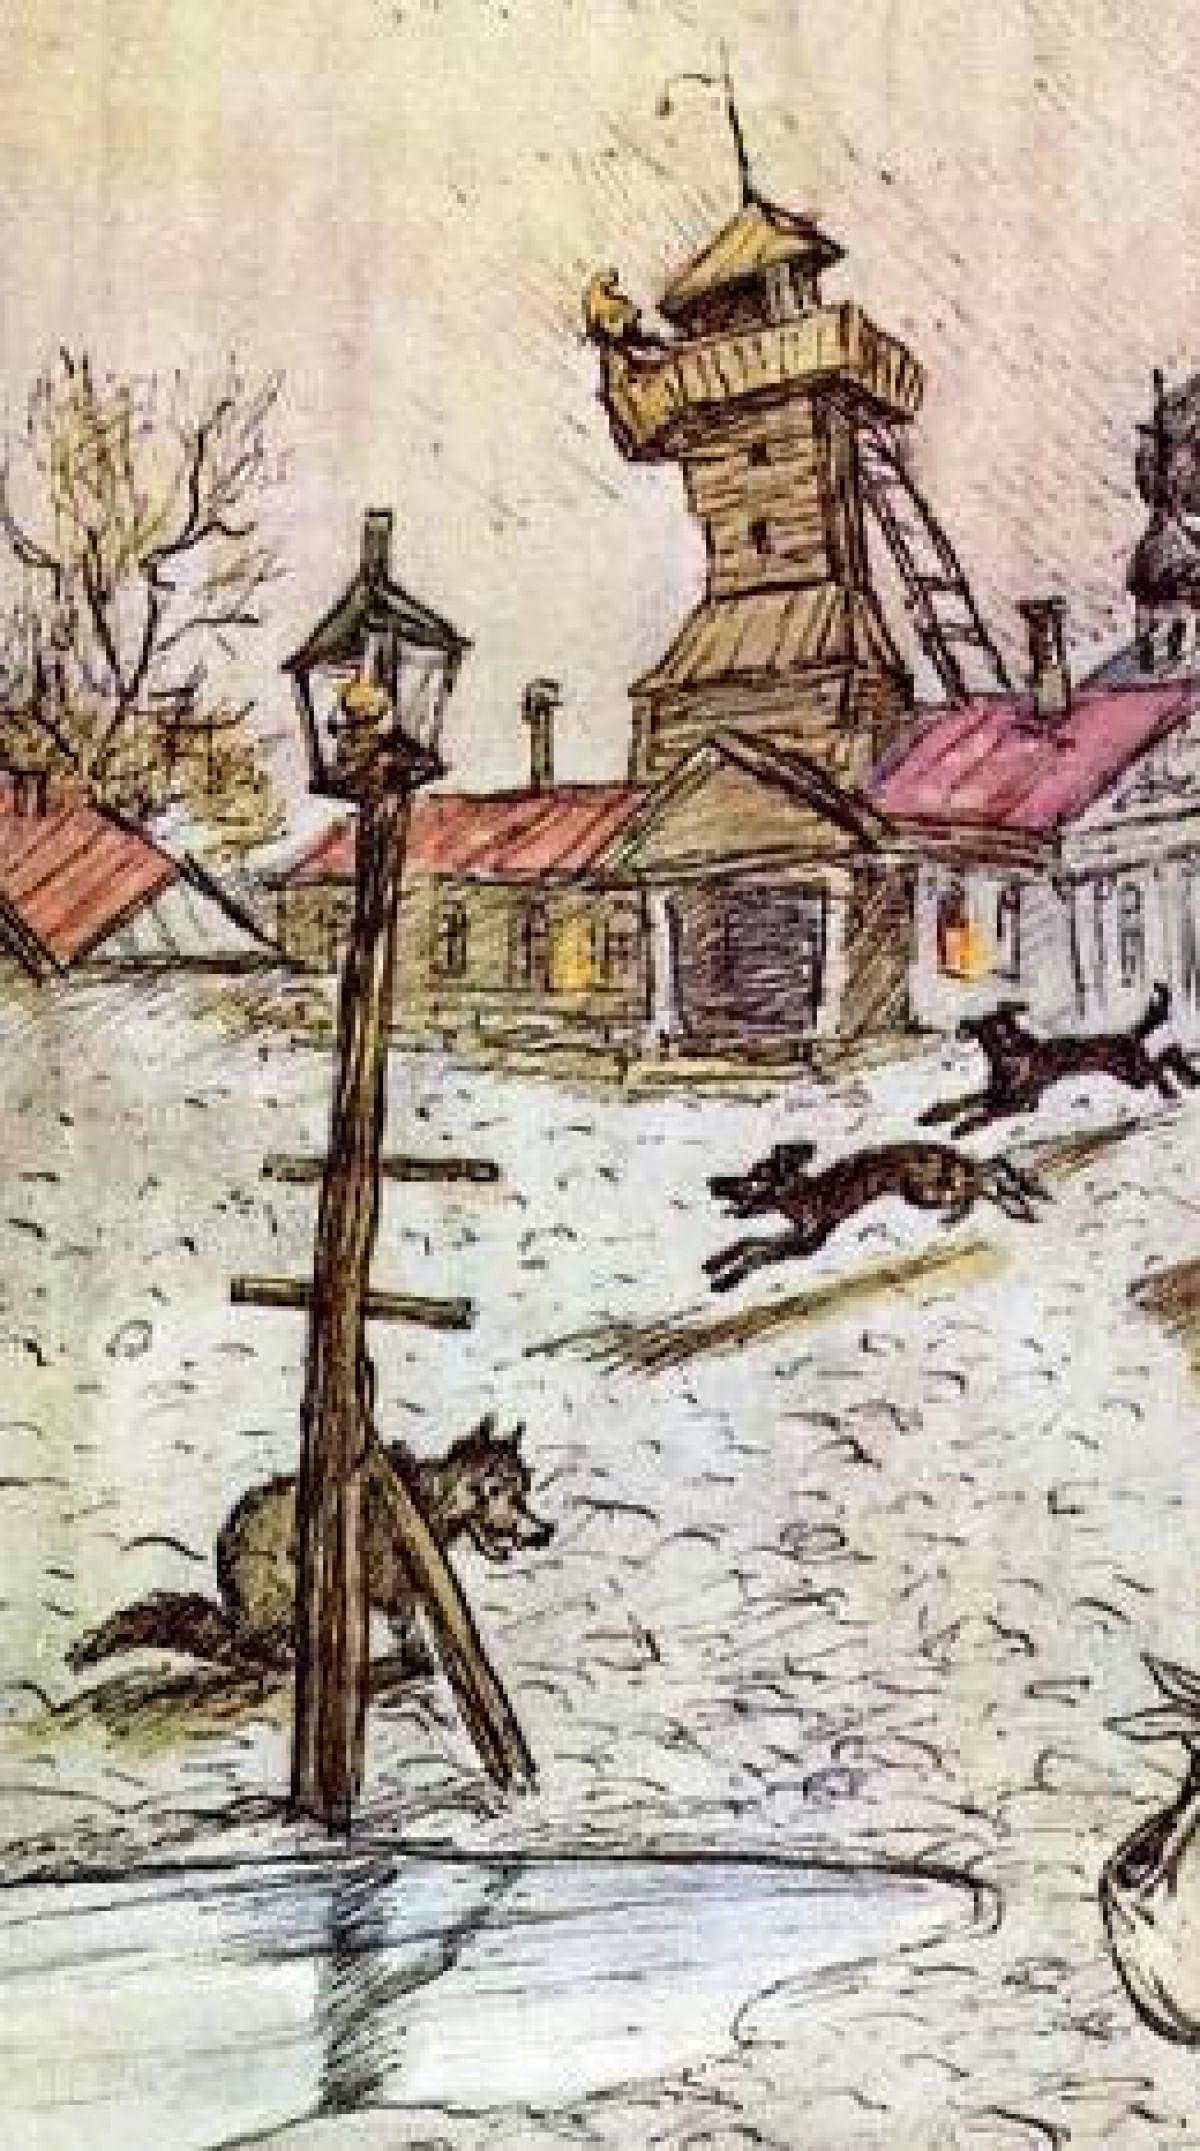 Иллюстрации к сказкам М.Е. Салтыкова-Щедрина